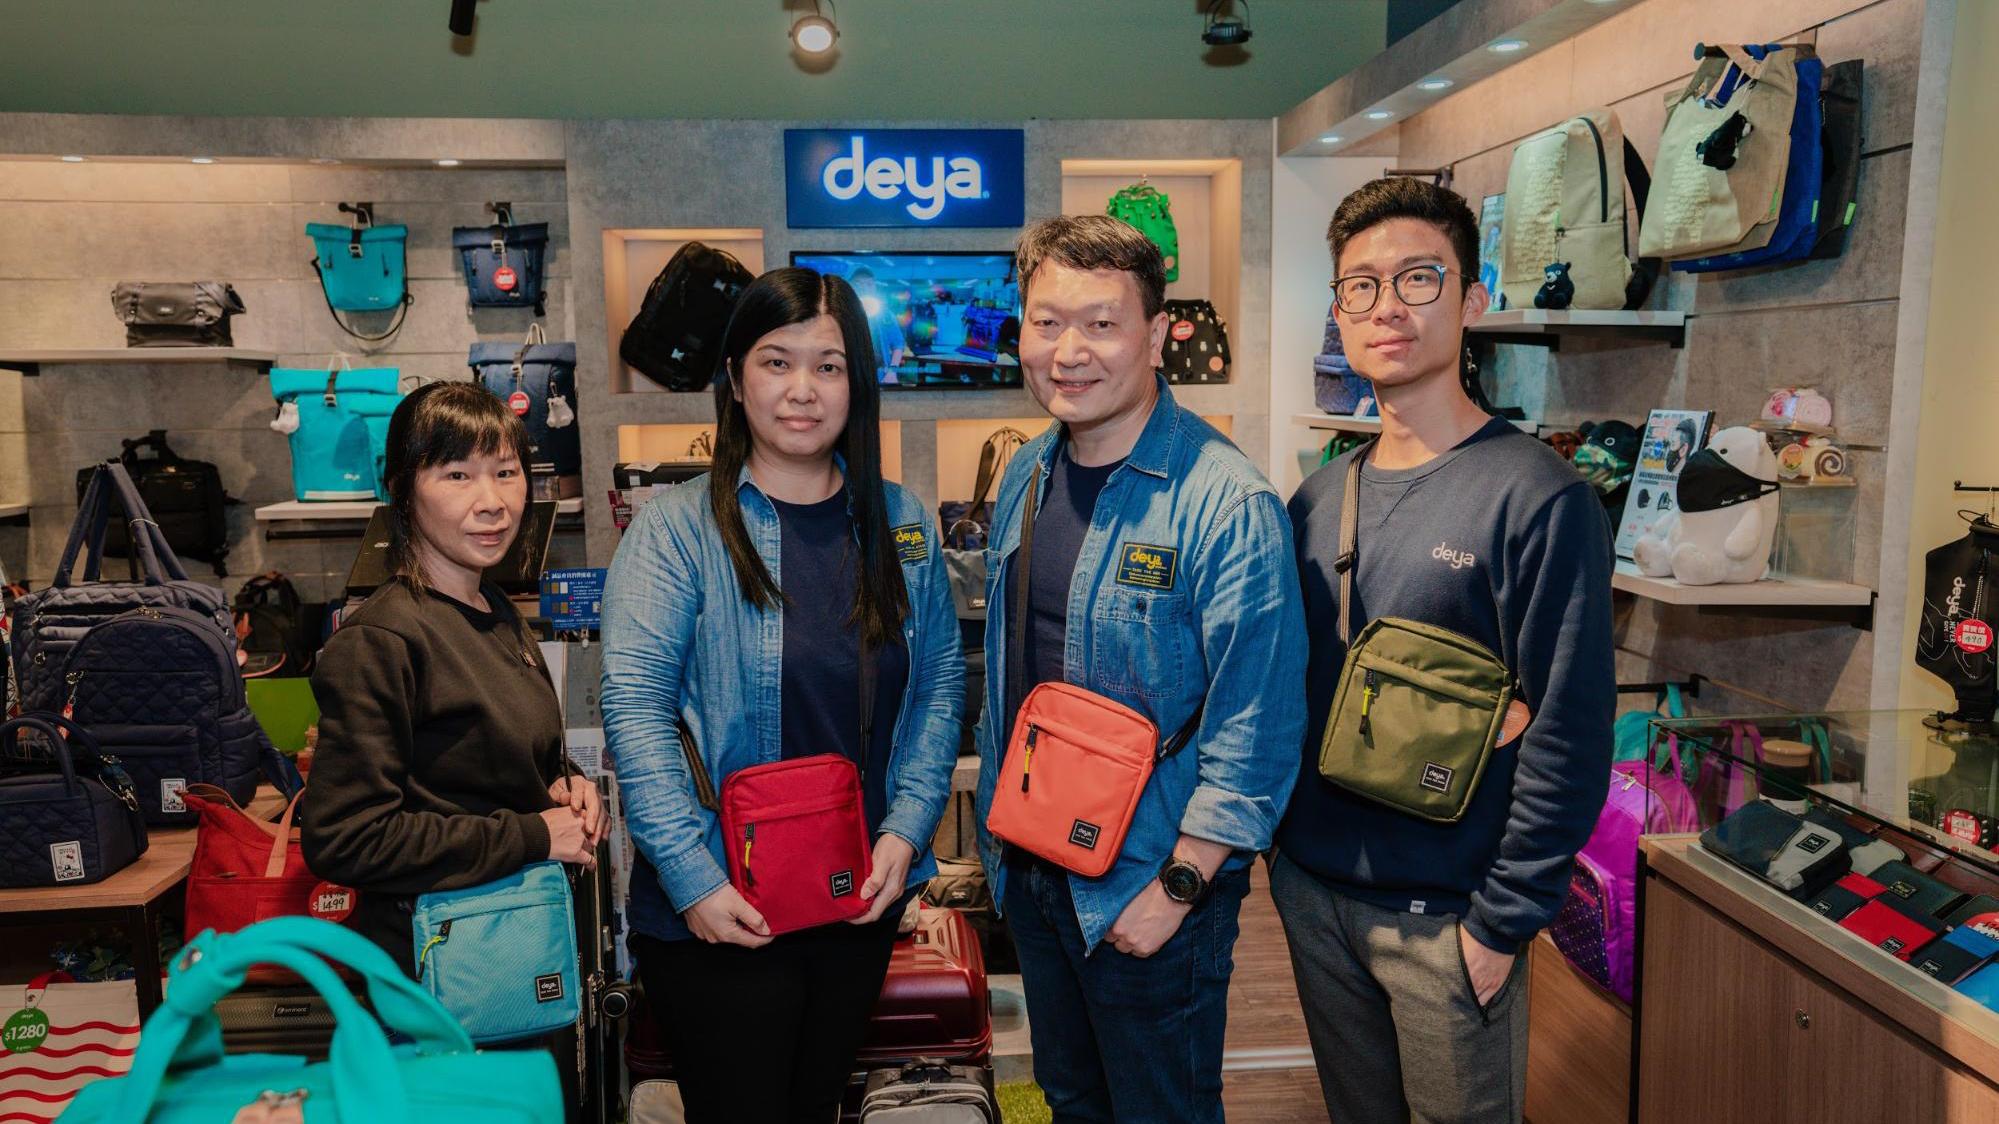 deya:從迷失方向到晉升百萬電商!包包品牌發現成功關鍵在「數位力量」